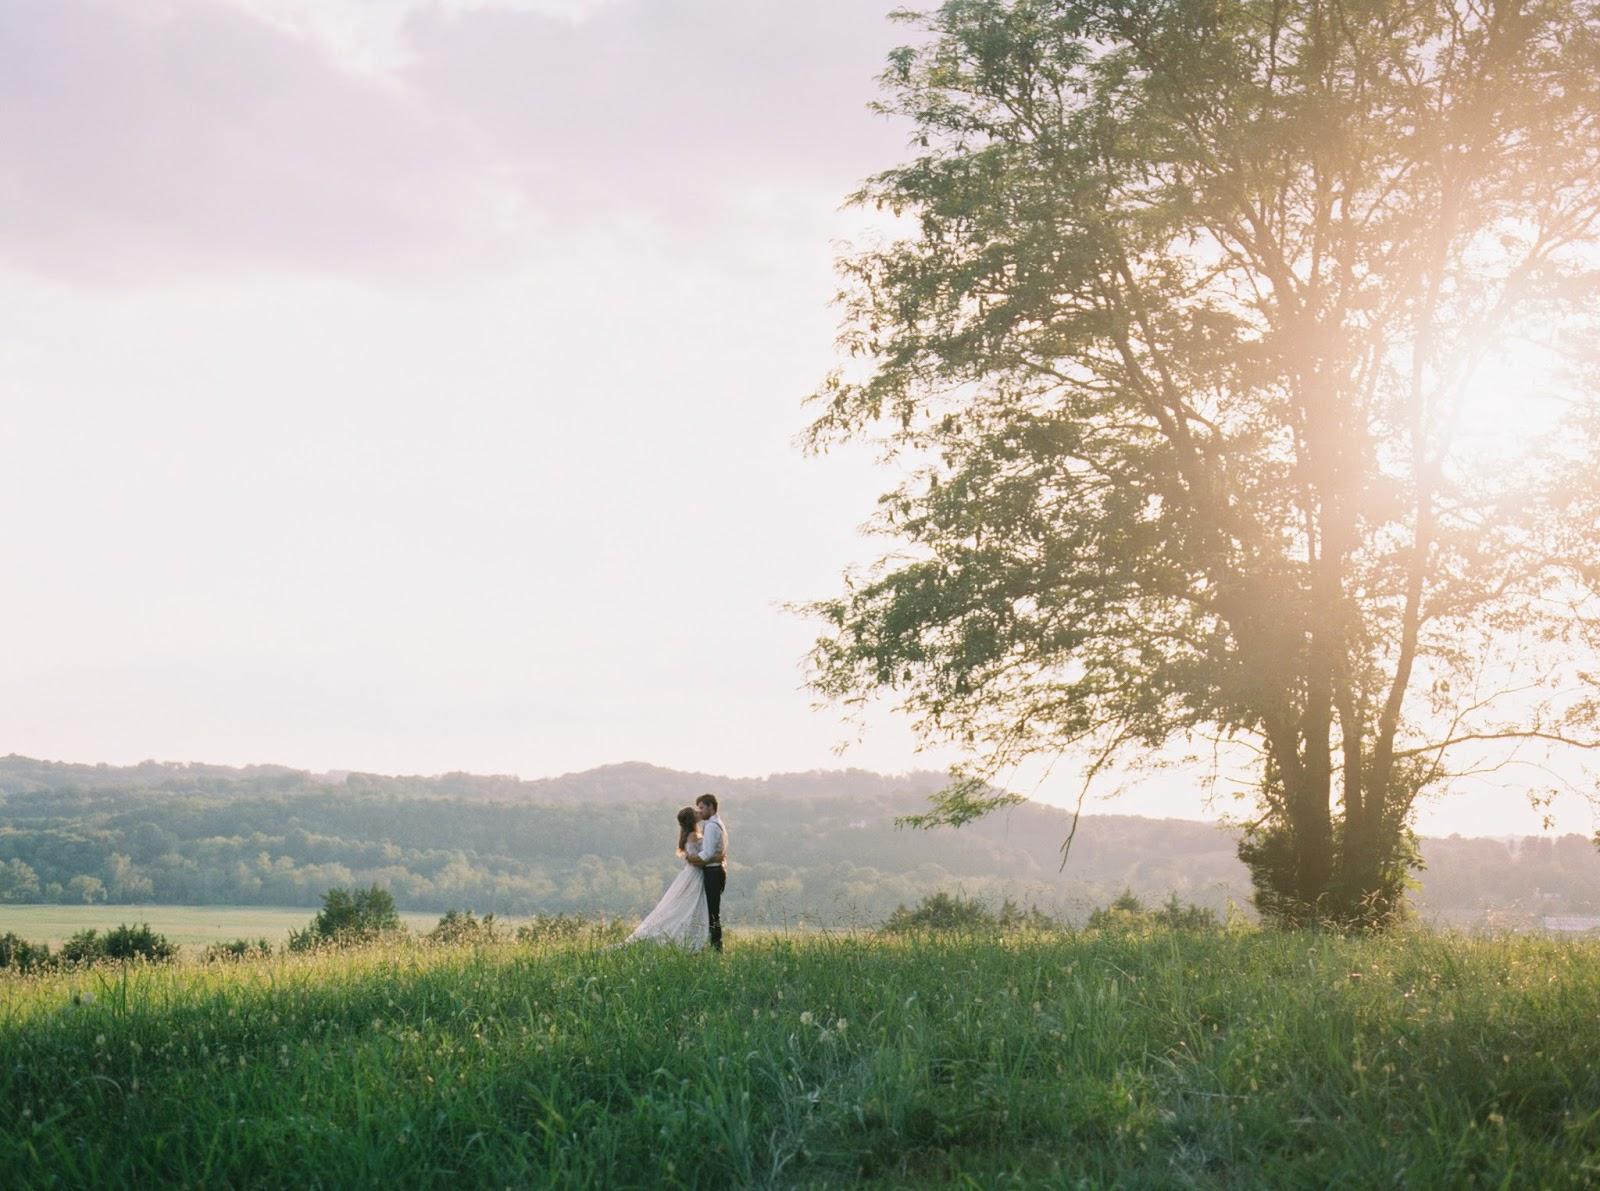 Sevier_Blumen_Editorial_Abigail_Malone_Photography-106-1.jpg